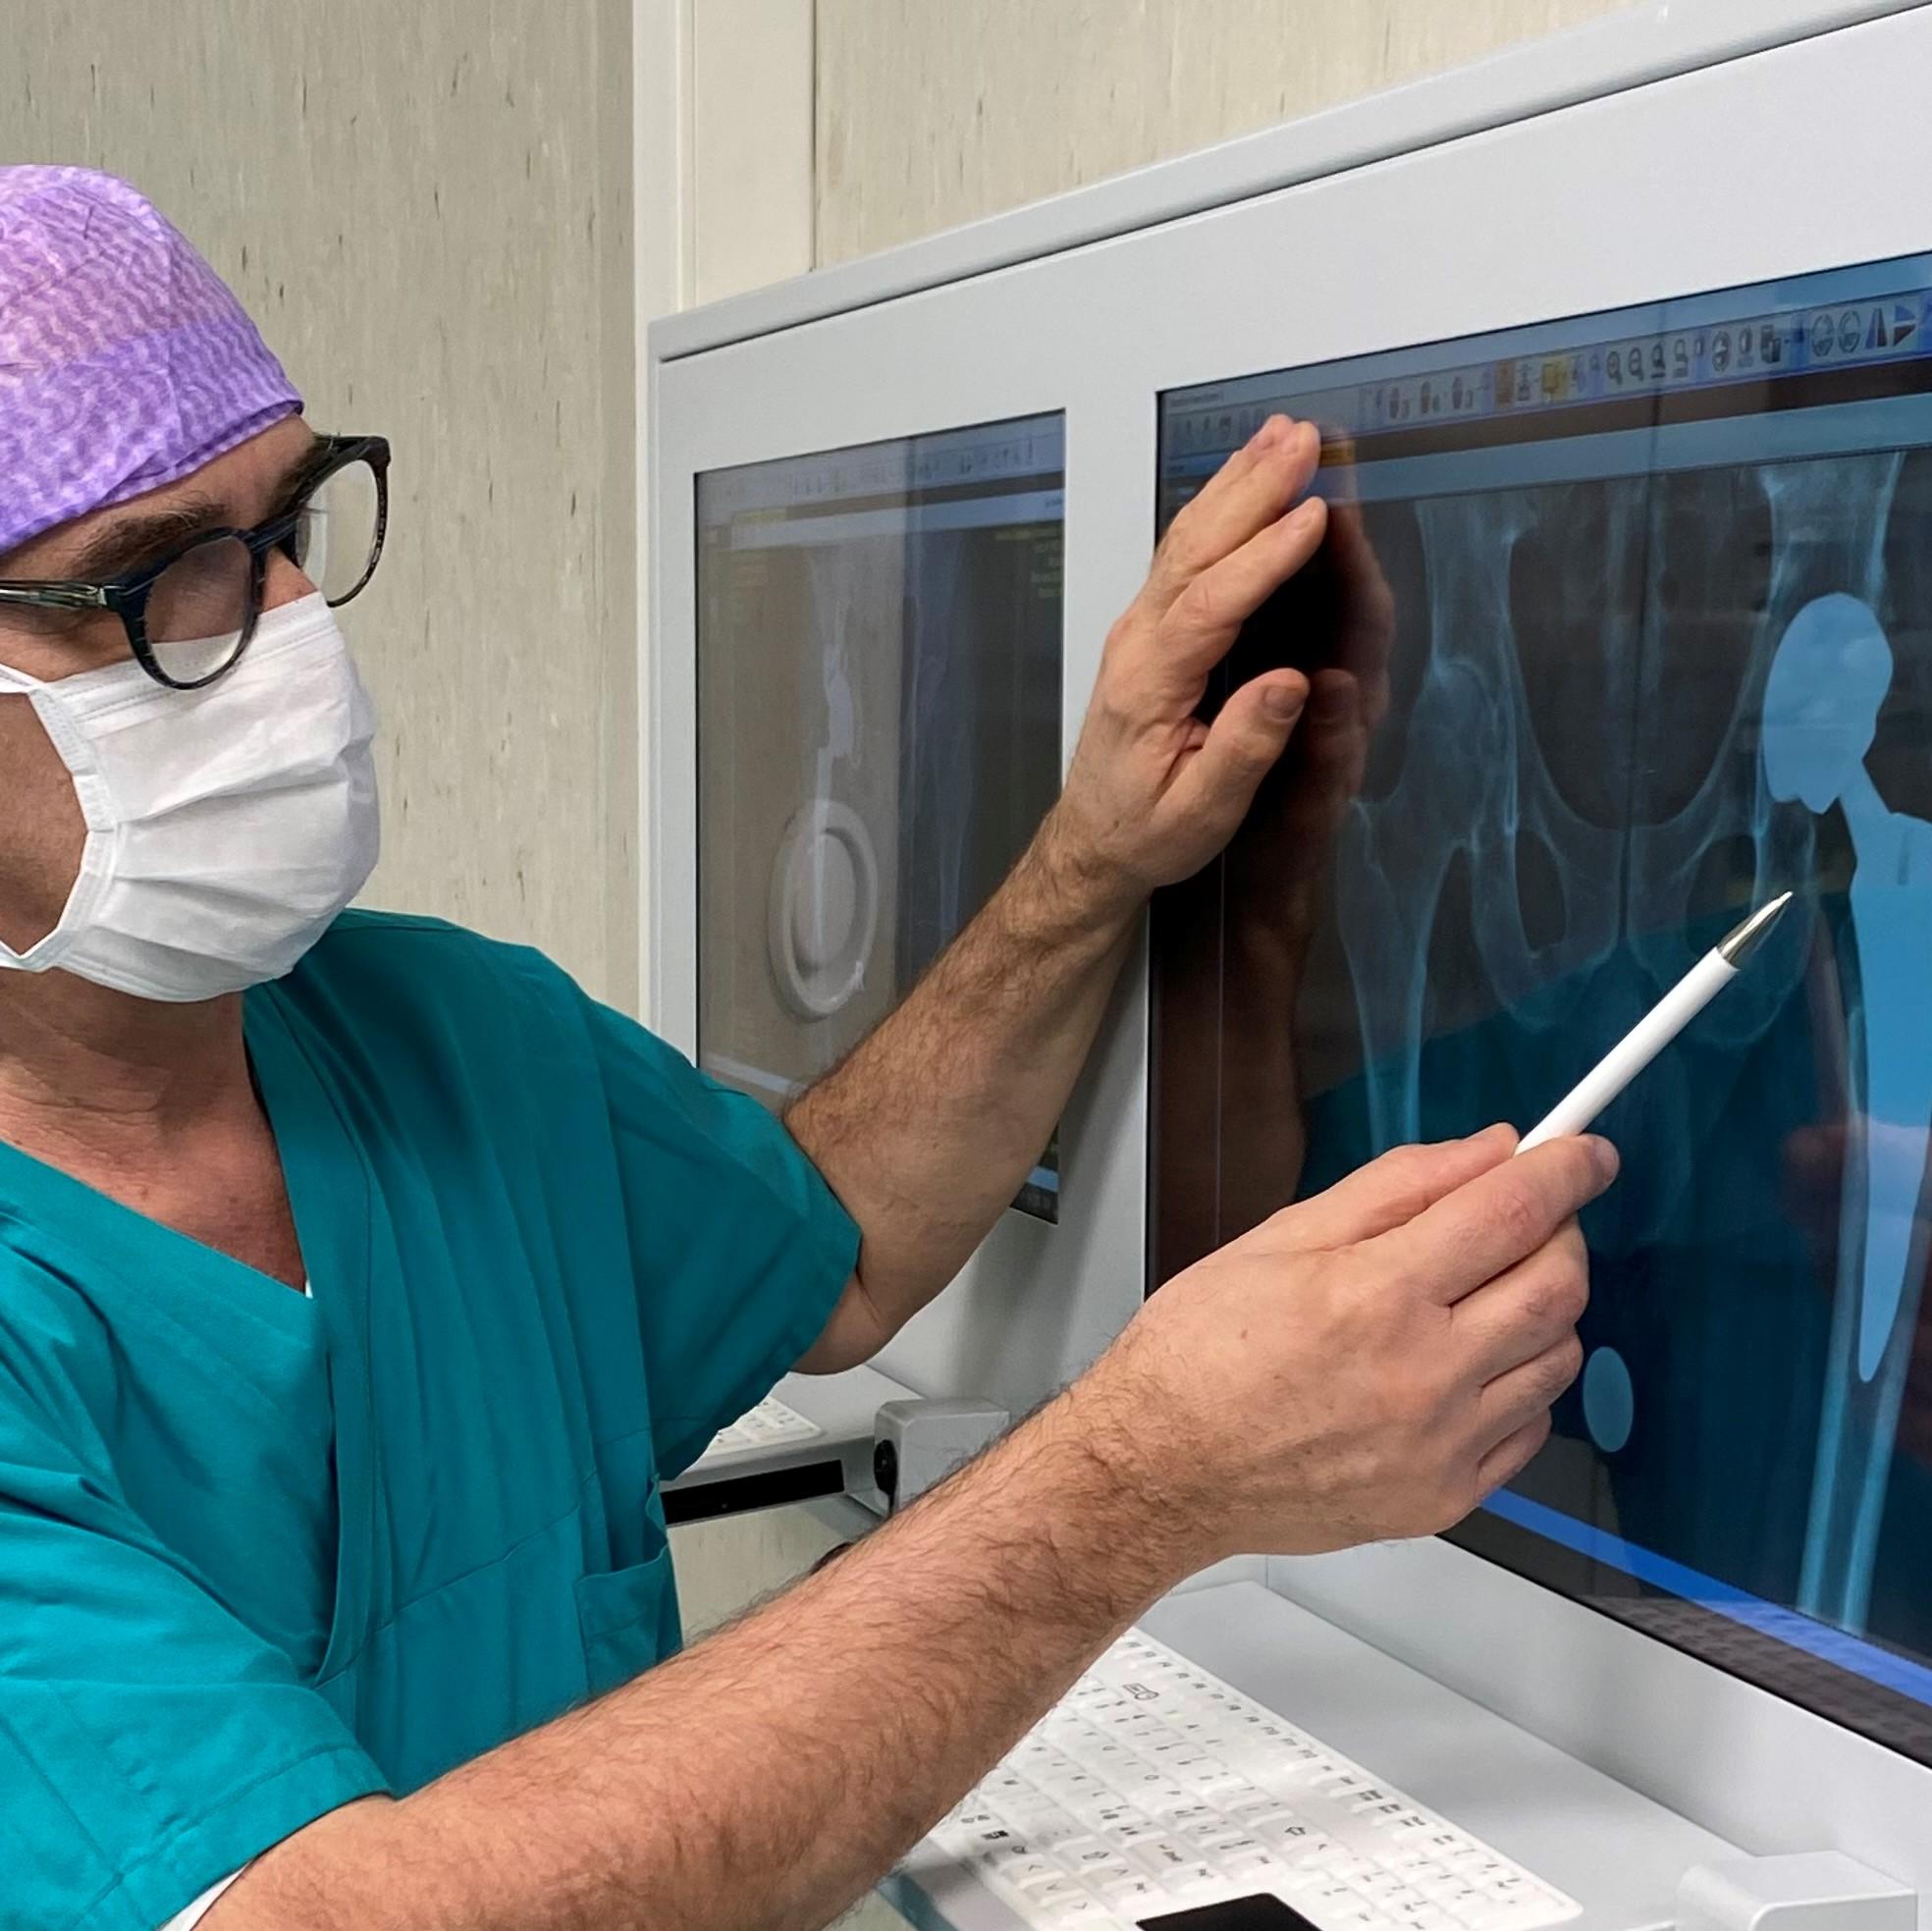 Prof. Vaienti in sala operatoria dopo intervento protesi anca